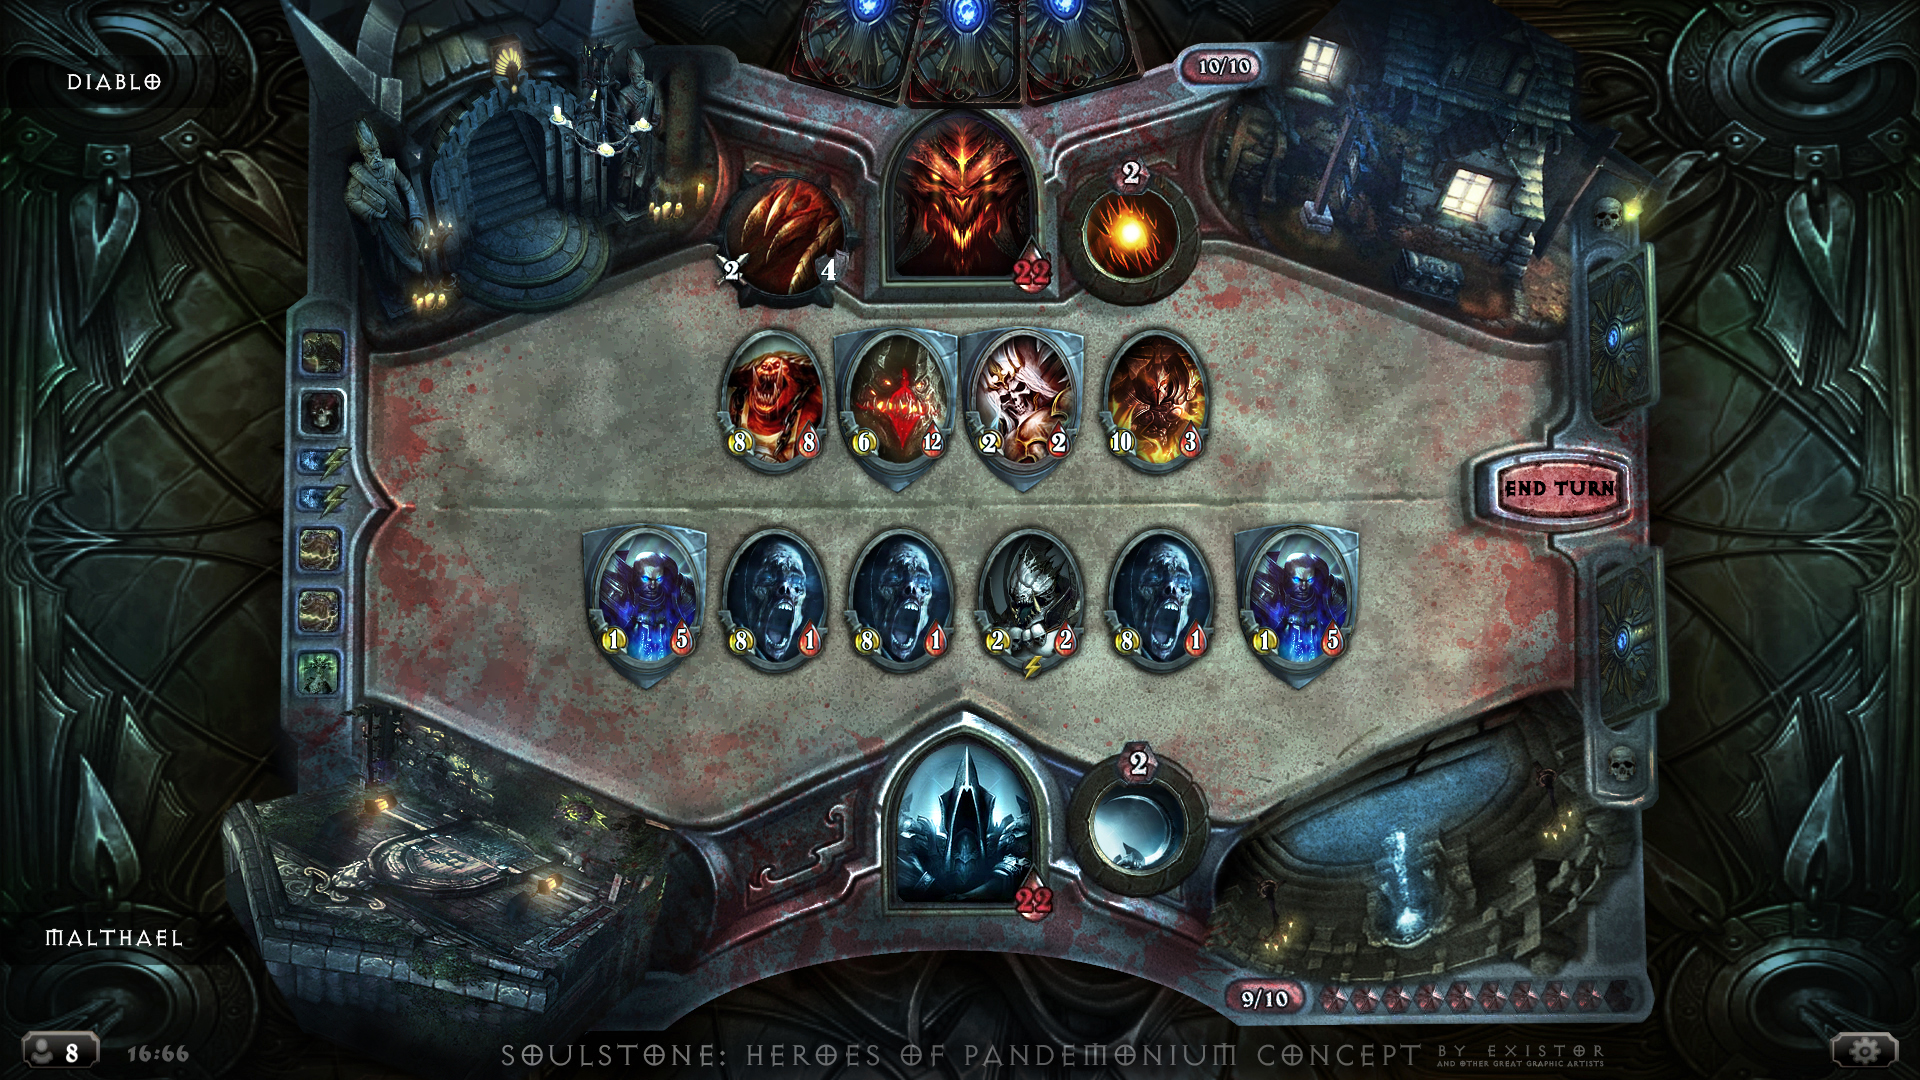 Soulstone: Heroes of Pandemonium - concept by Dexistor371